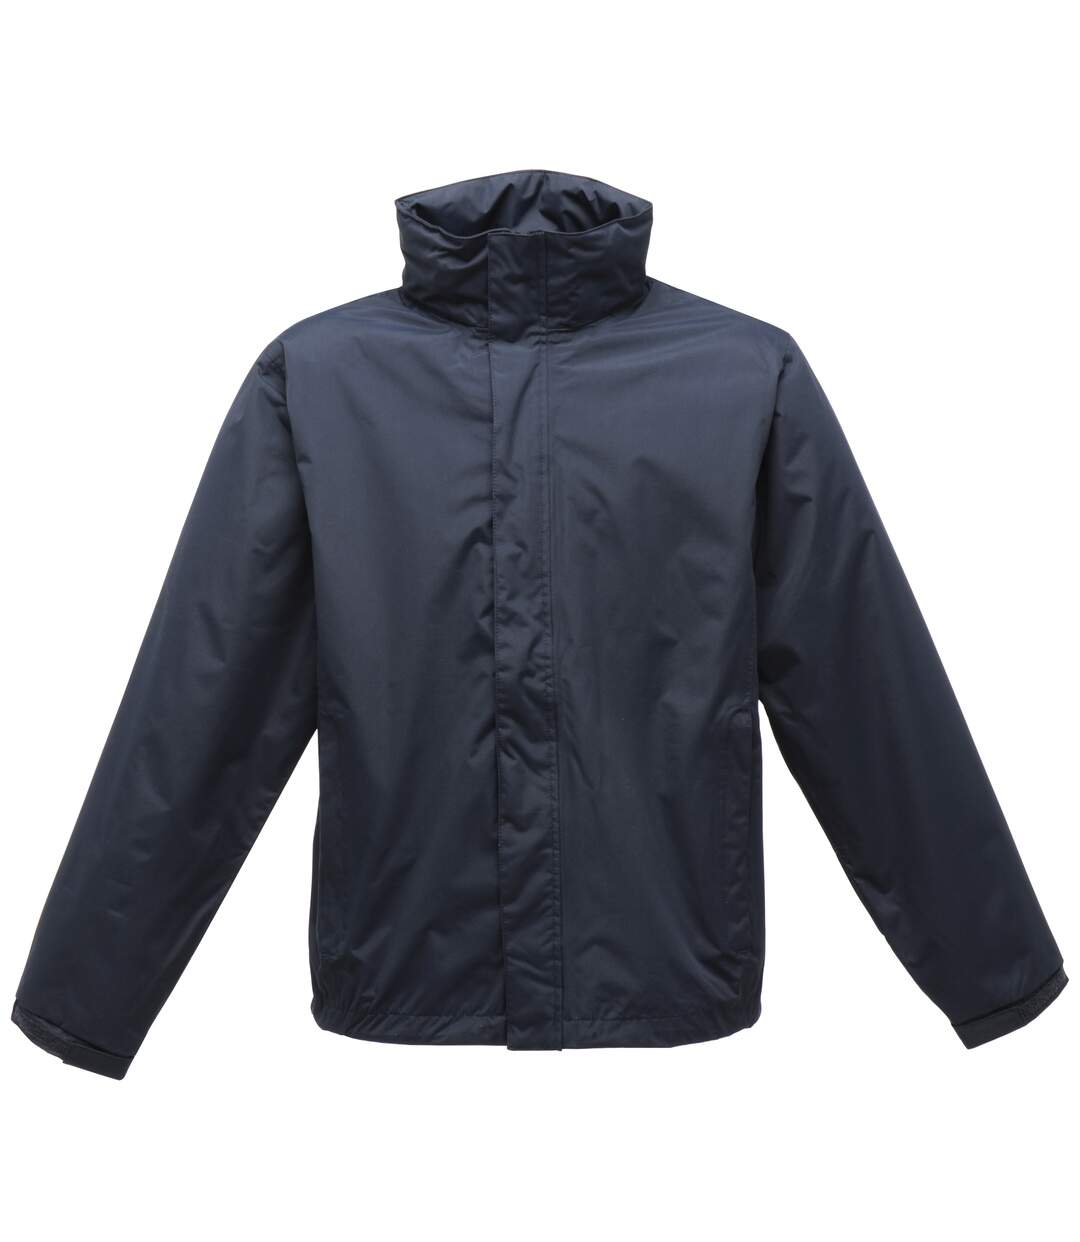 Regatta Mens Pace II Lightweight Waterproof Jacket (Navy) - UTRG1546